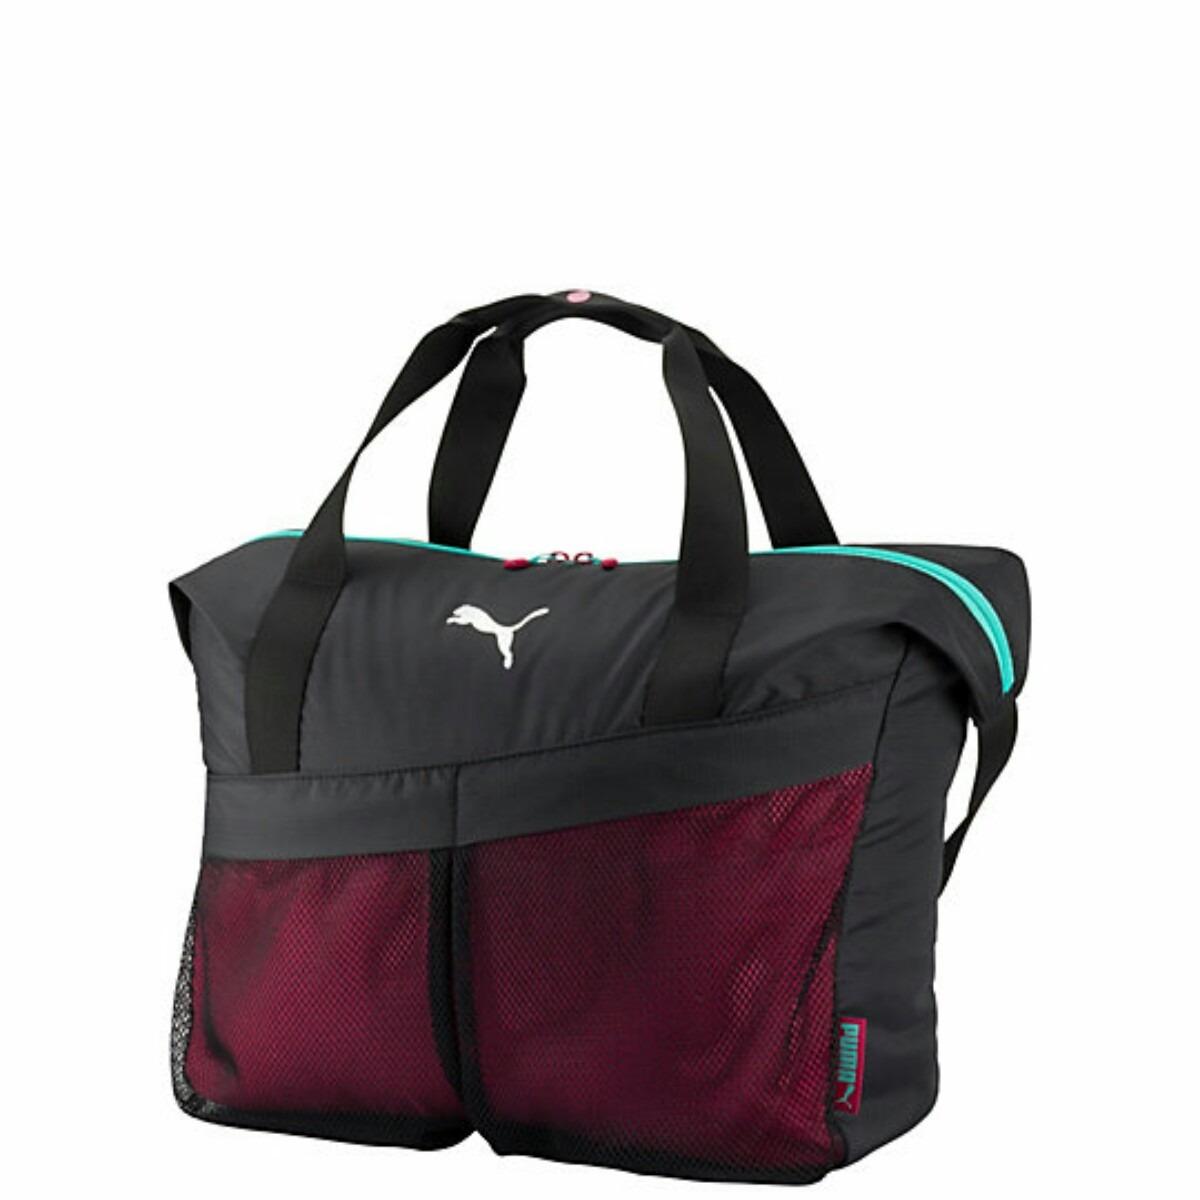 Bolsa fitness feminina puma : Bolsa puma fitness workout feminina r em mercado